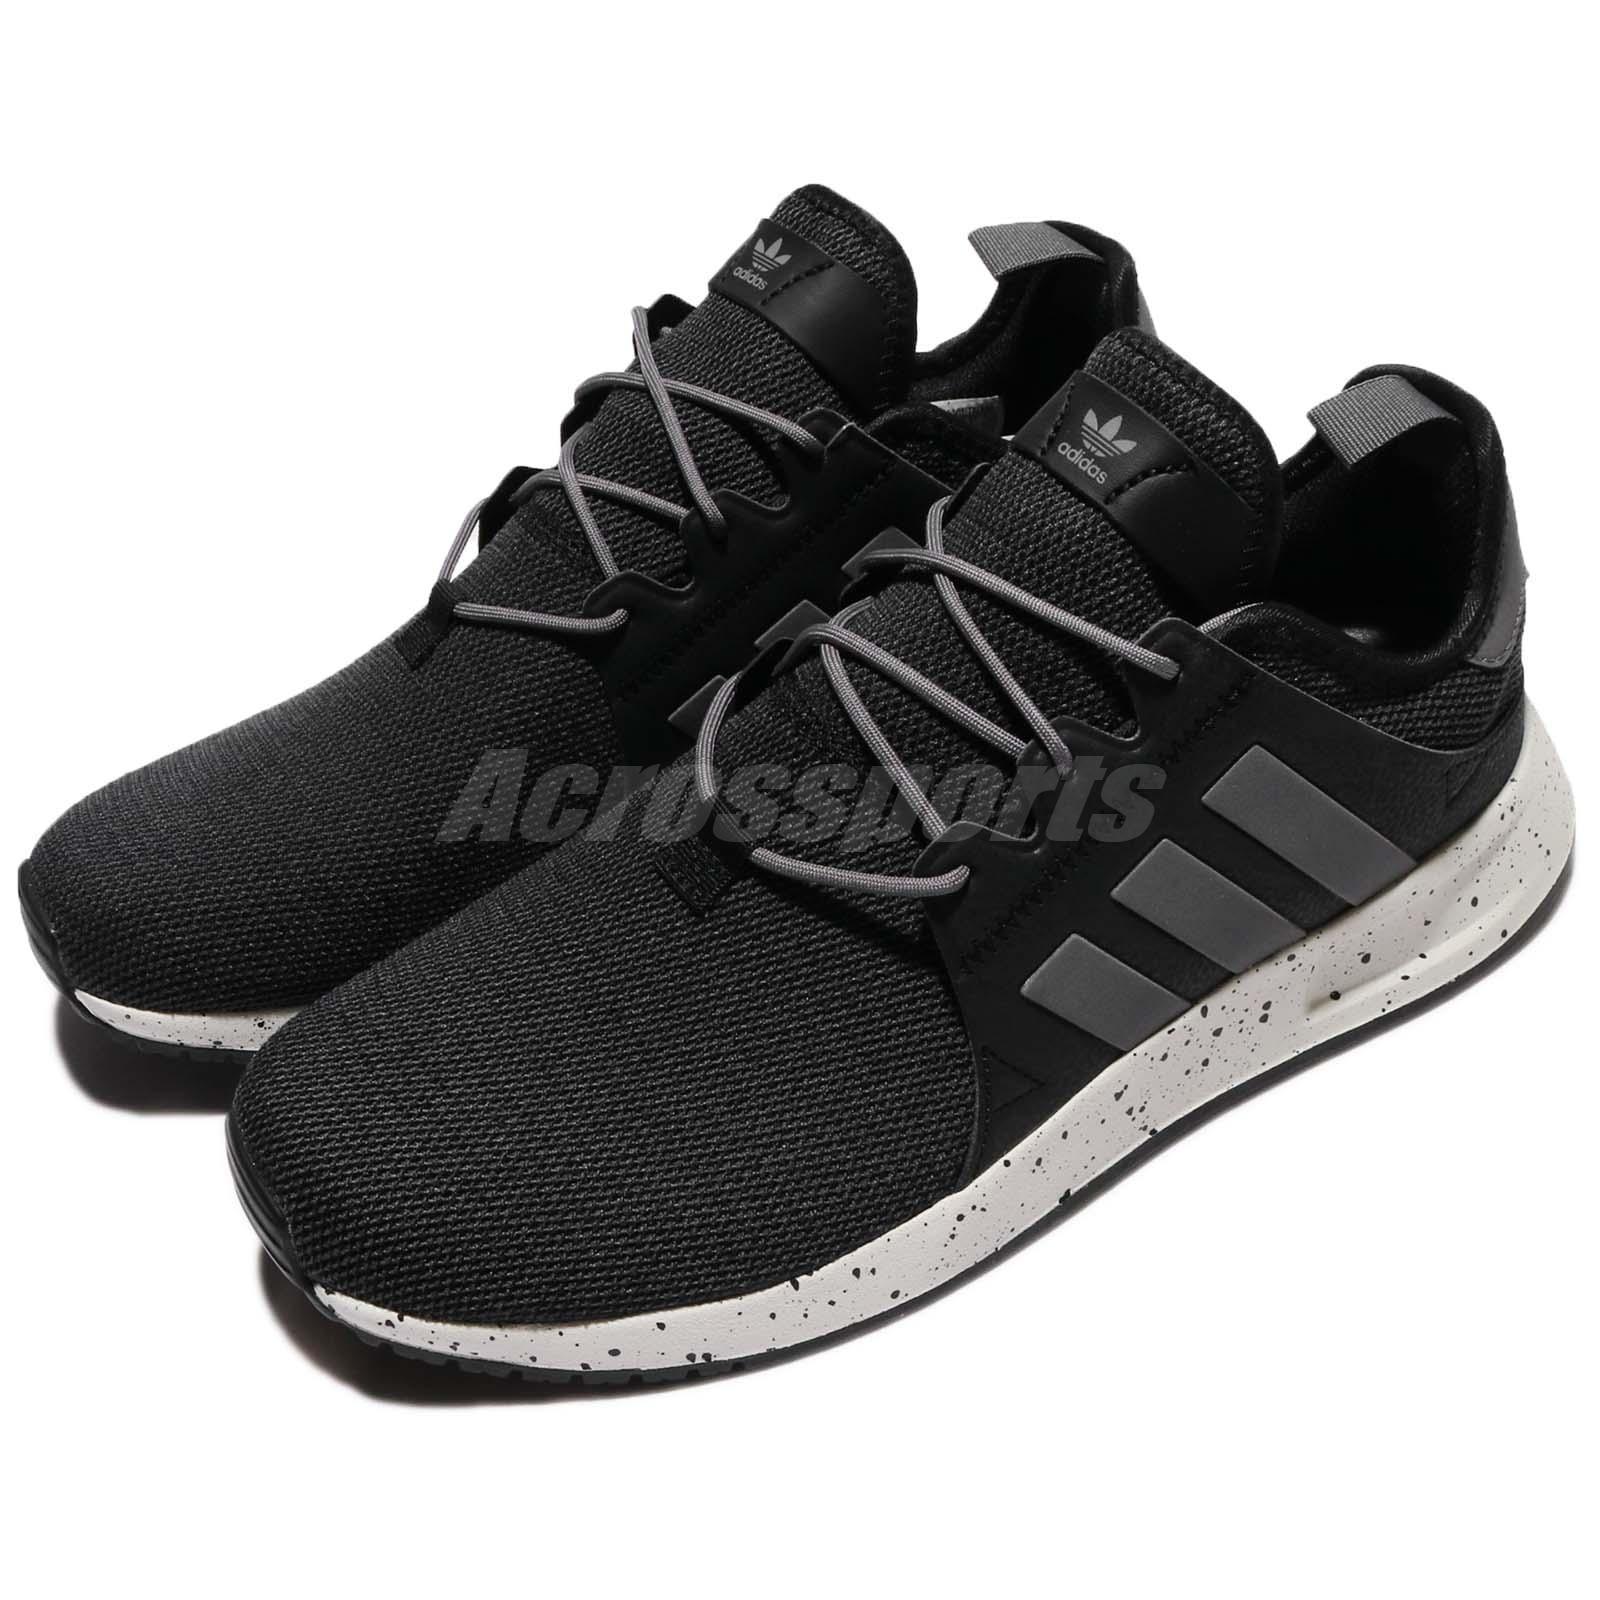 a9b3f70af81 Detalles acerca de Adidas Originals   PLR Negro Gris Hombres X Mujeres  Zapatos Tenis Para Correr Entrenador BY9254- mostrar título original